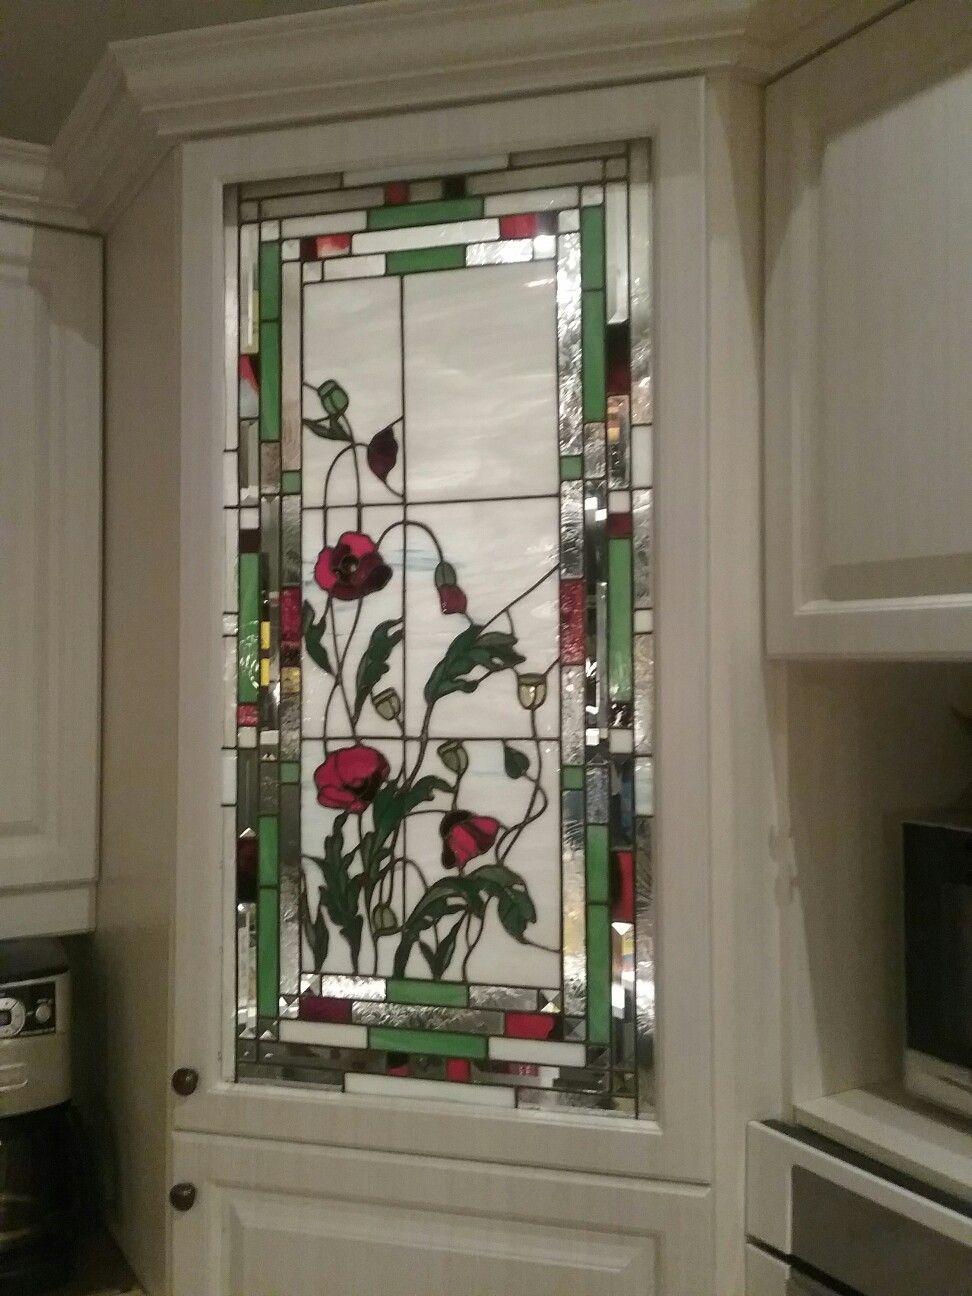 Pin de stacyandersen en House-Stained Glass | Pinterest | Vidrieras ...